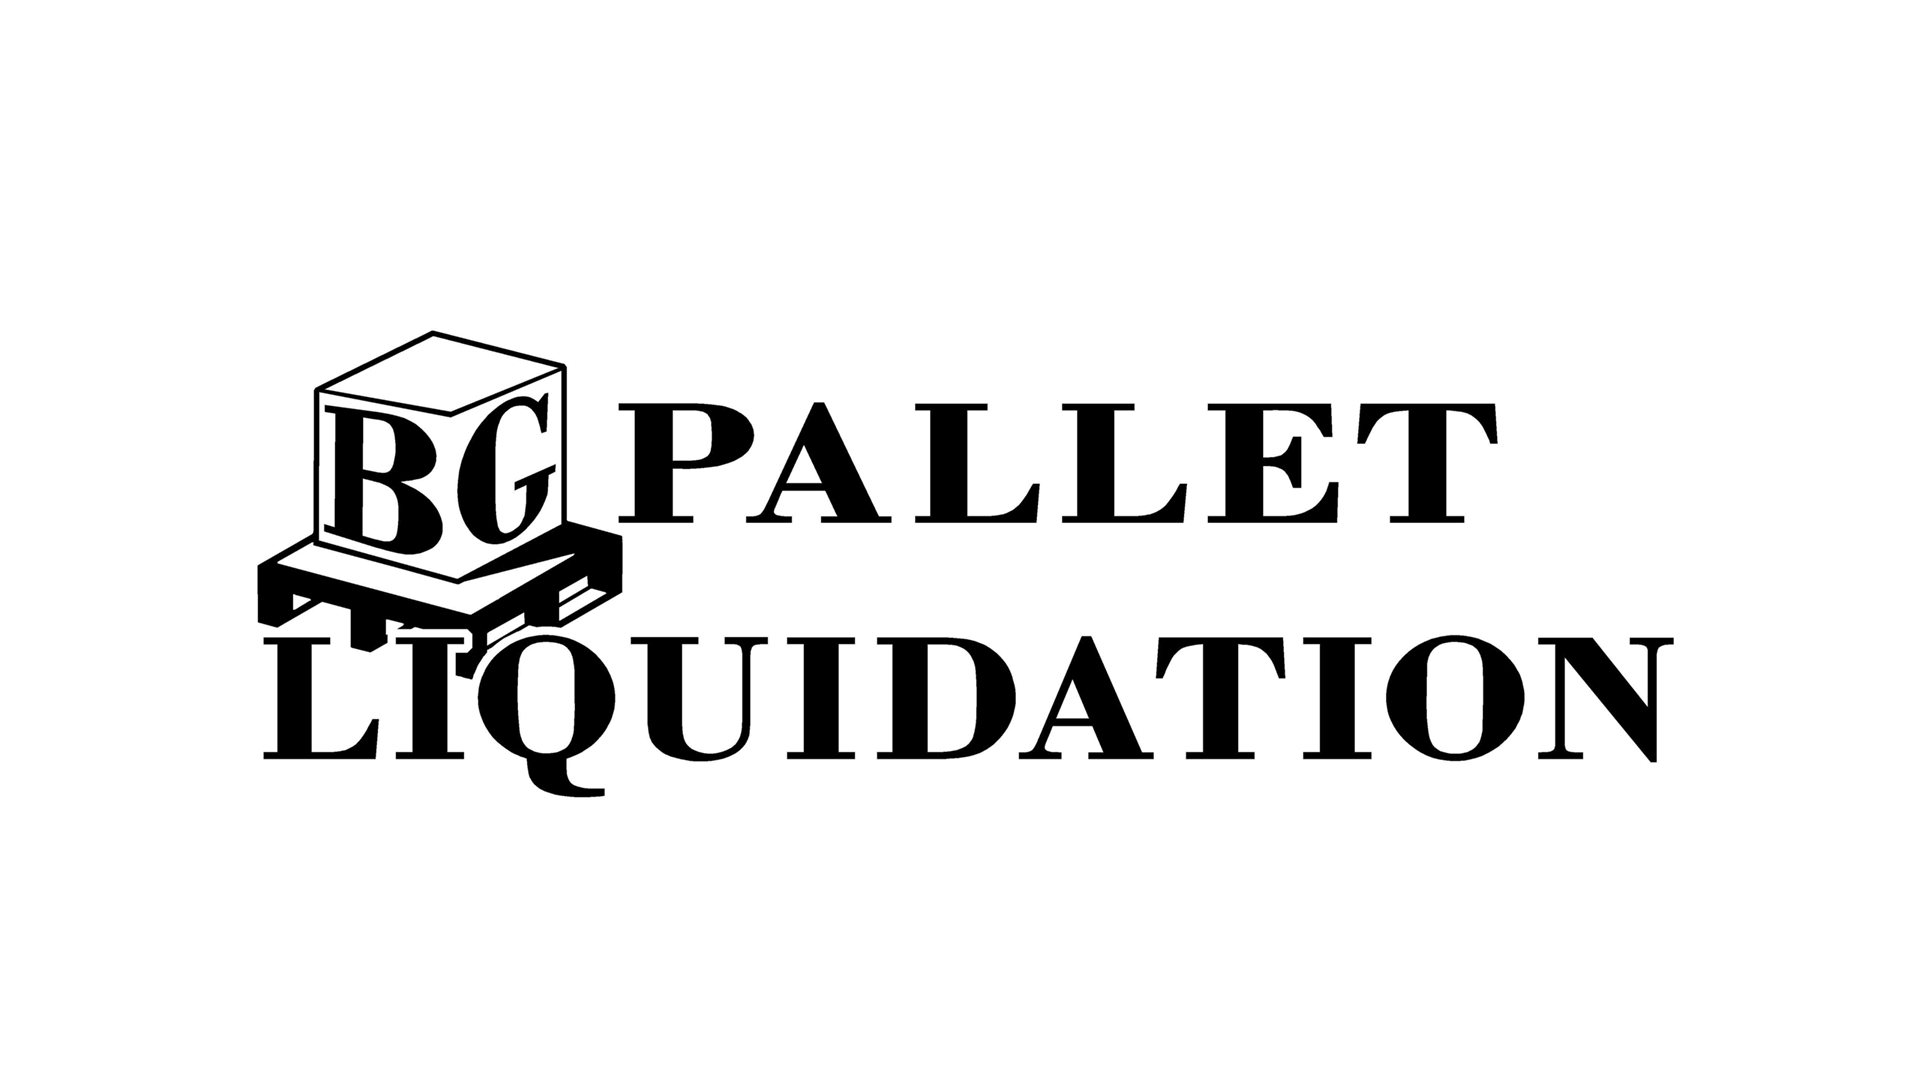 Bg Pallet Liquidation Web Page